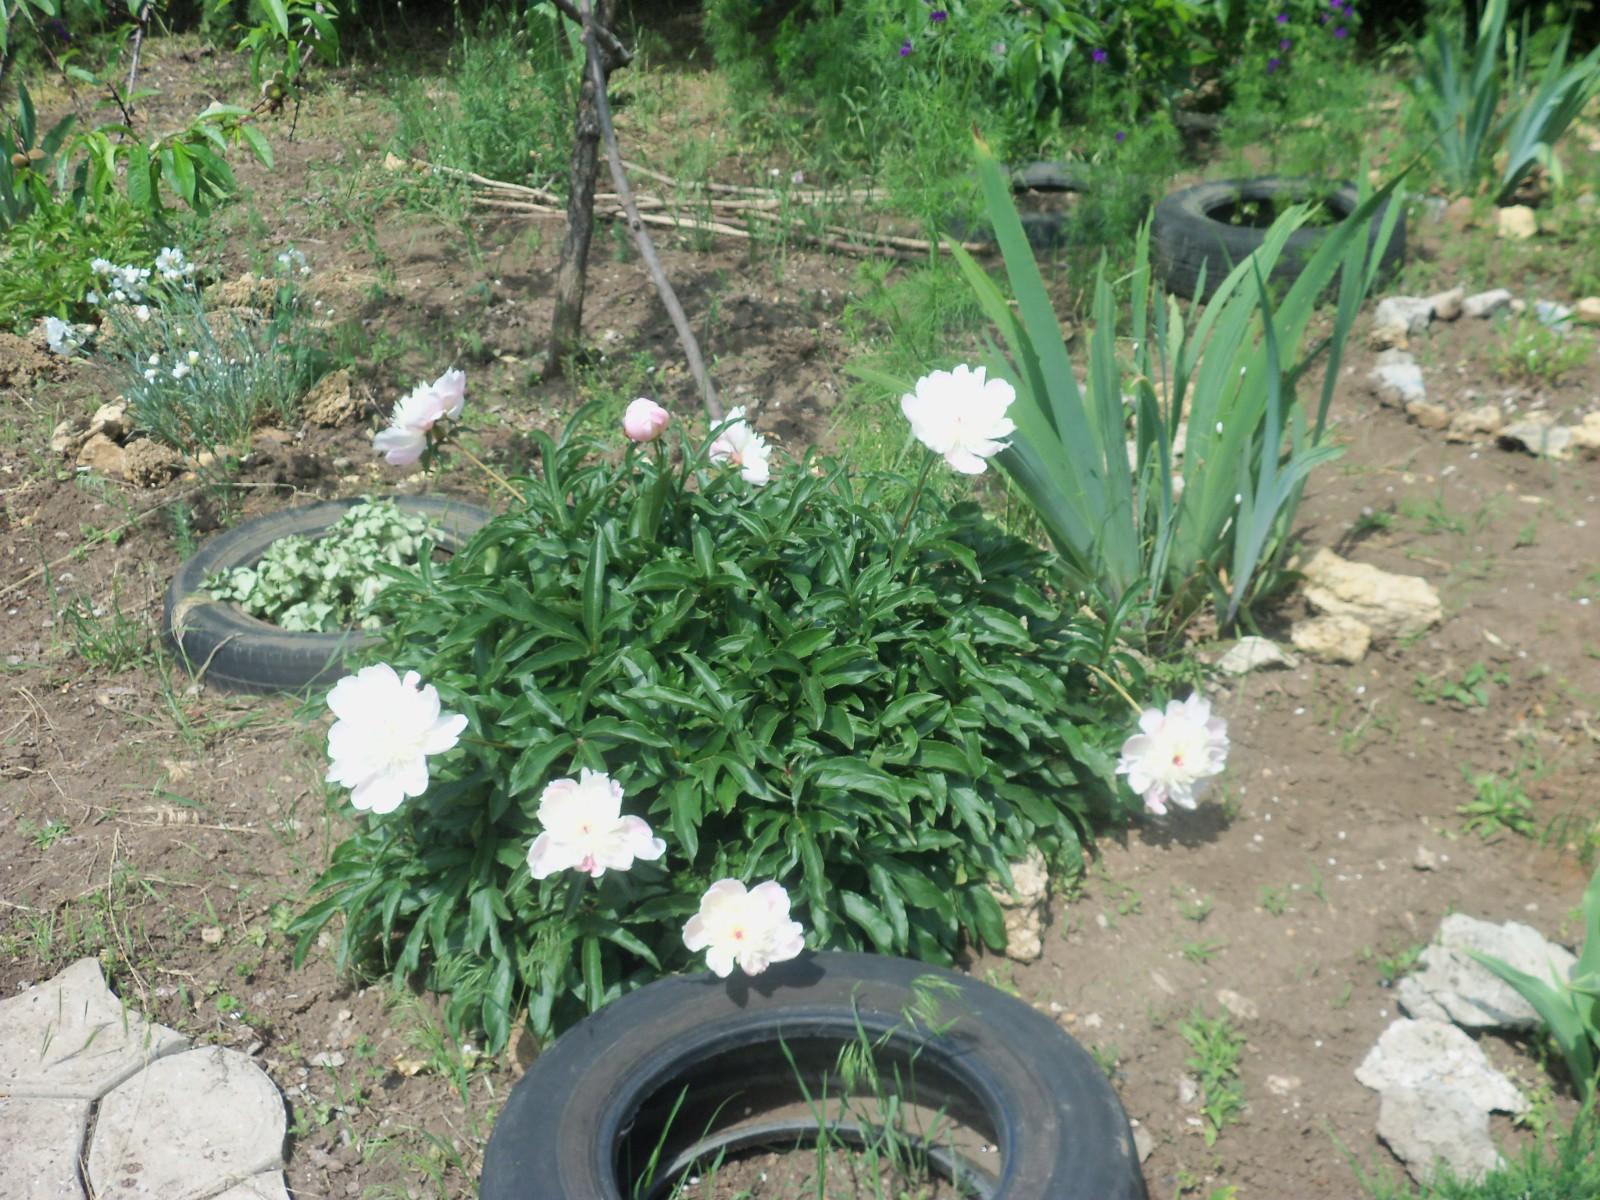 Садовые товарищи - Страница 4 2zfln9l